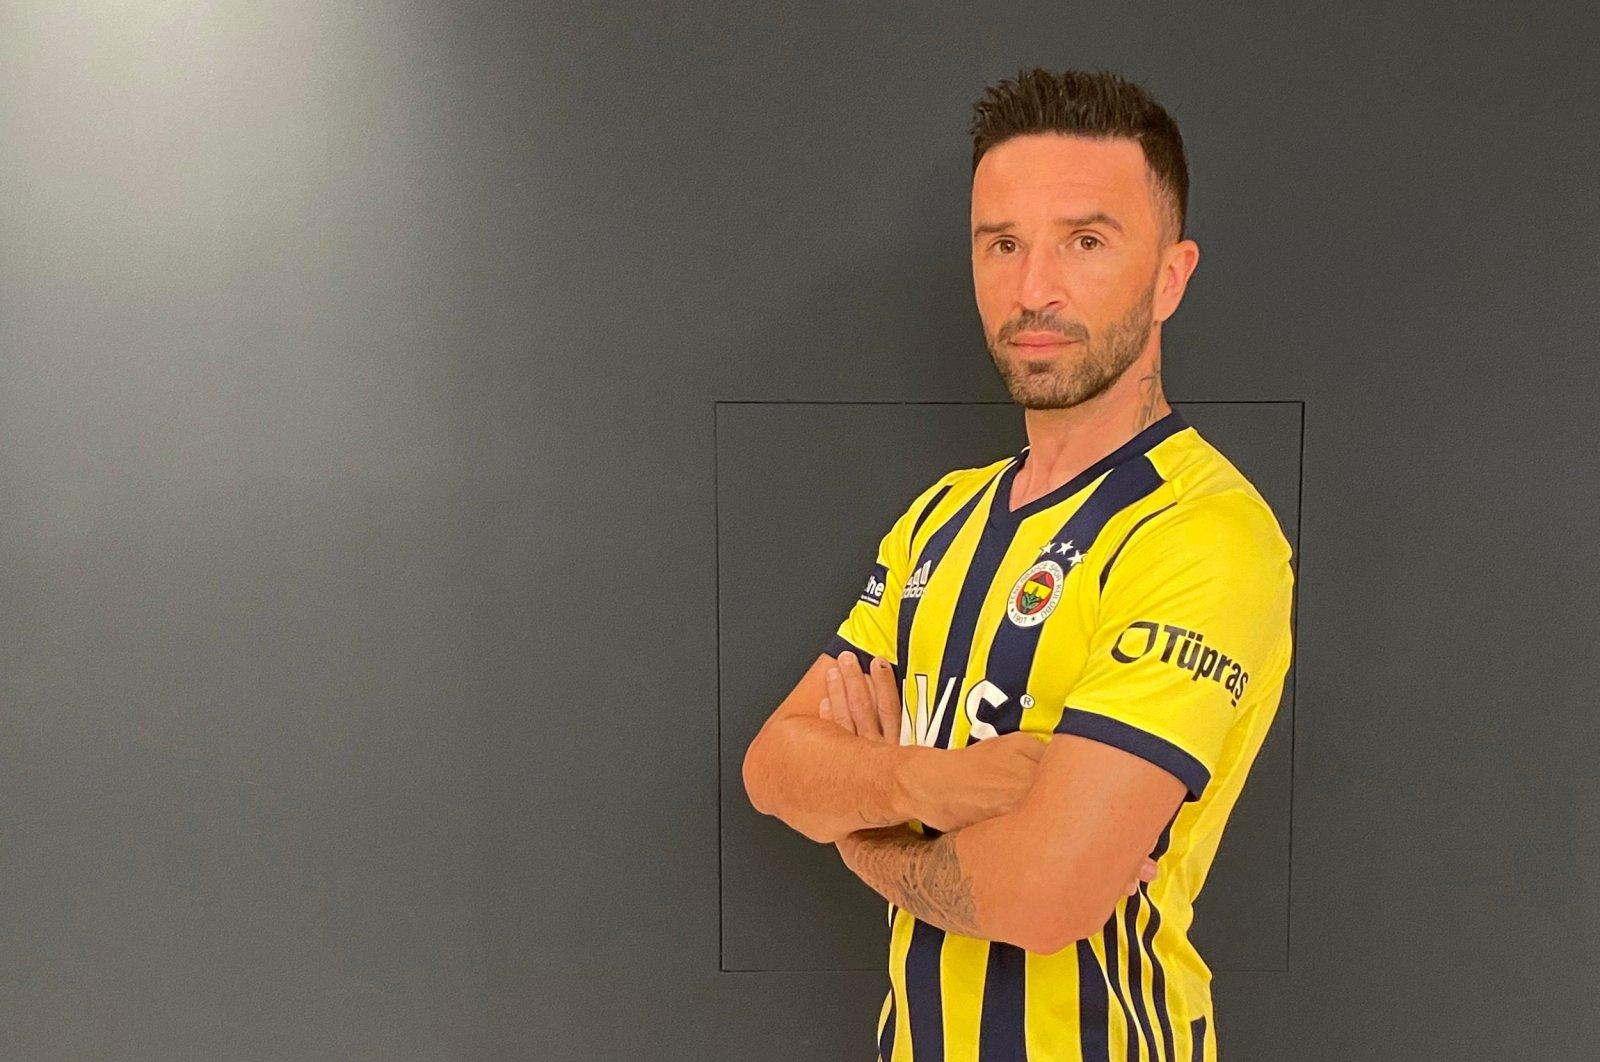 Gökhan Gönül poses with Fenerbahçe jersey, in Istanbul, Turkey, Aug. 6, 2020. (DHA Photo)